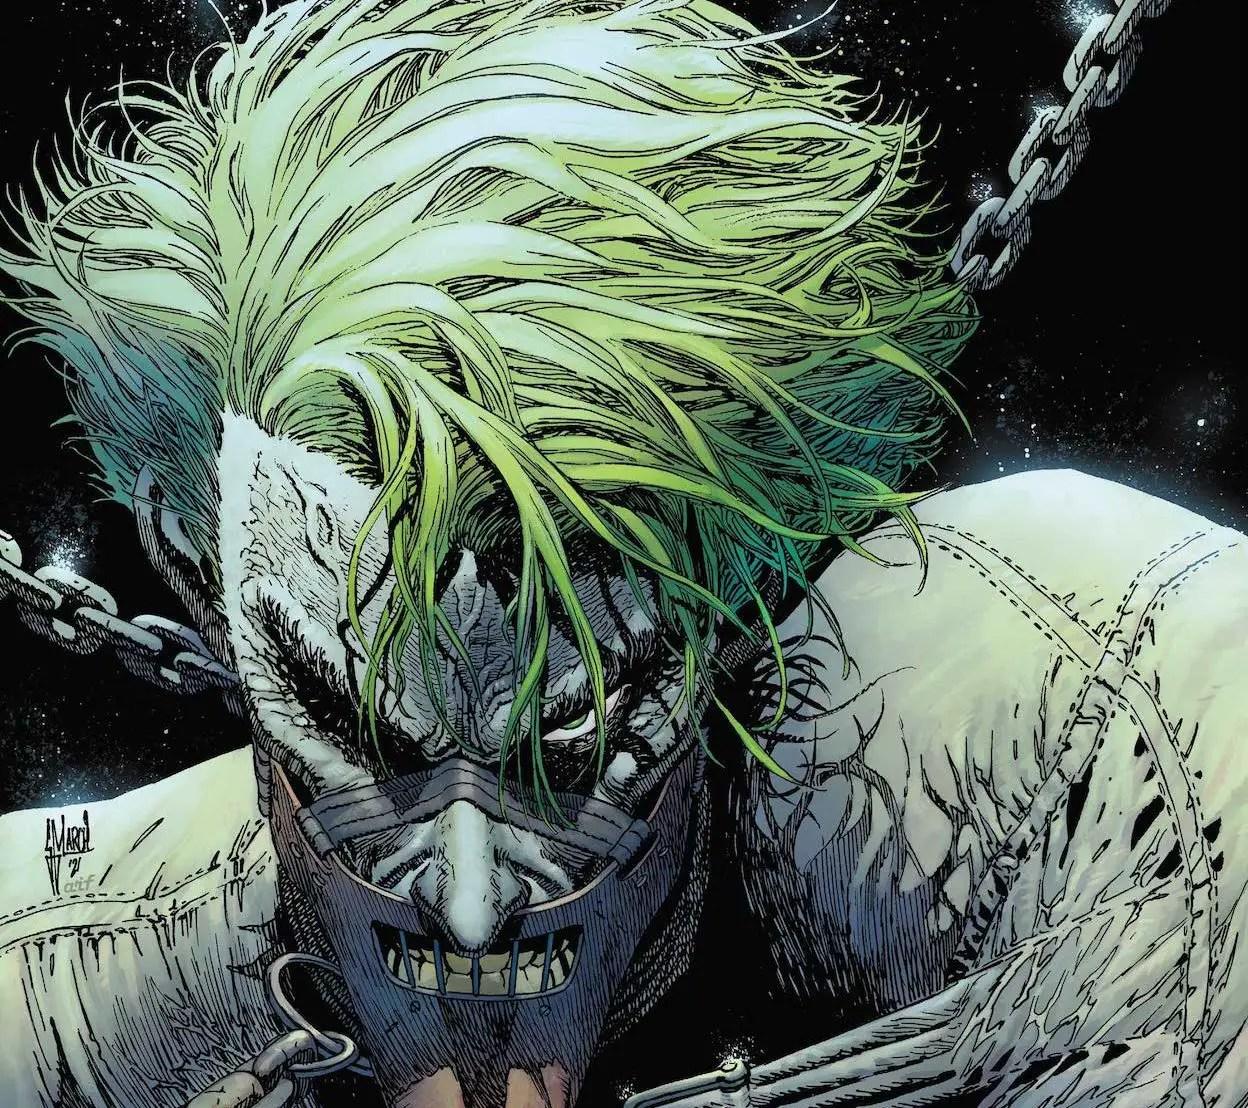 'The Joker' #5 is a haunting return to Jim Gordon's past